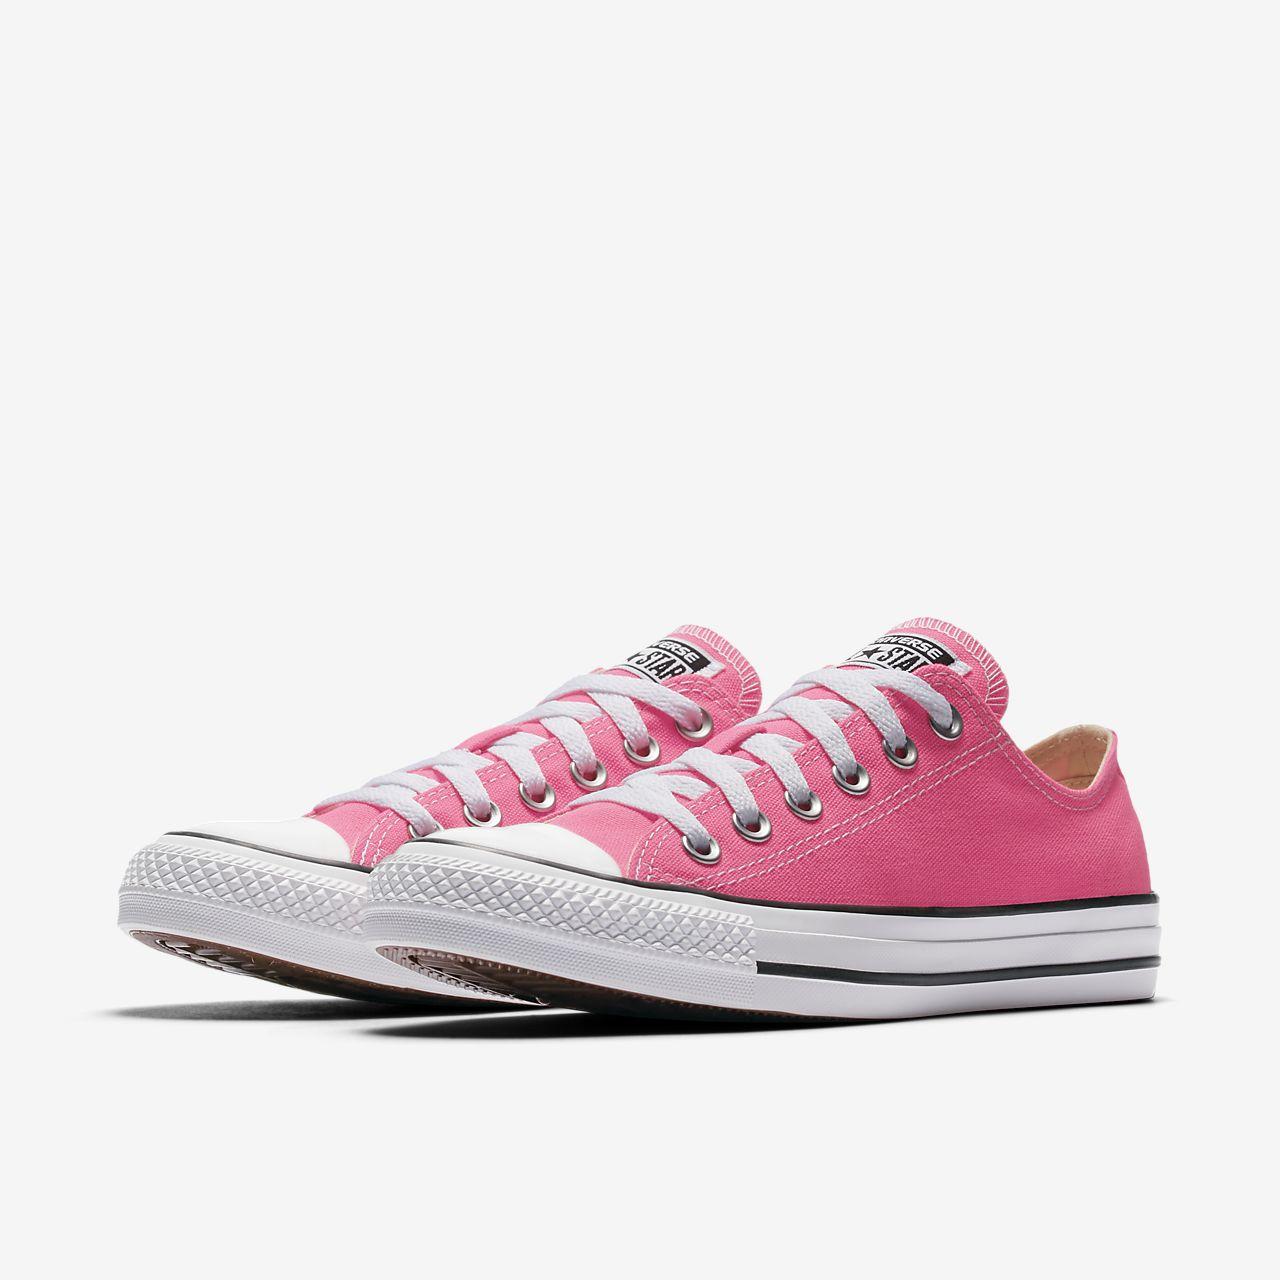 ... Converse Chuck Taylor All Star Seasonal Low Top Women's Shoe